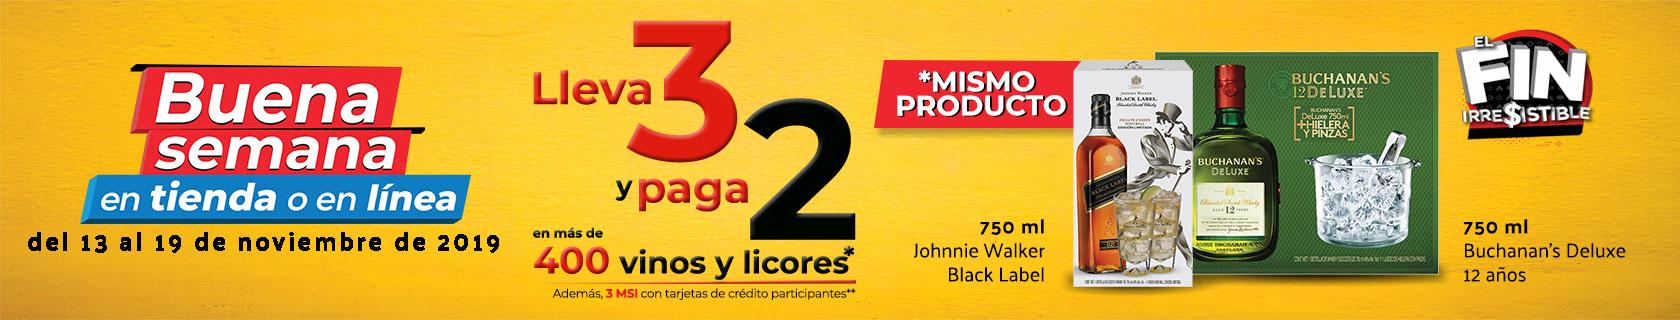 BPD-Buena-Semana-Nov15-2